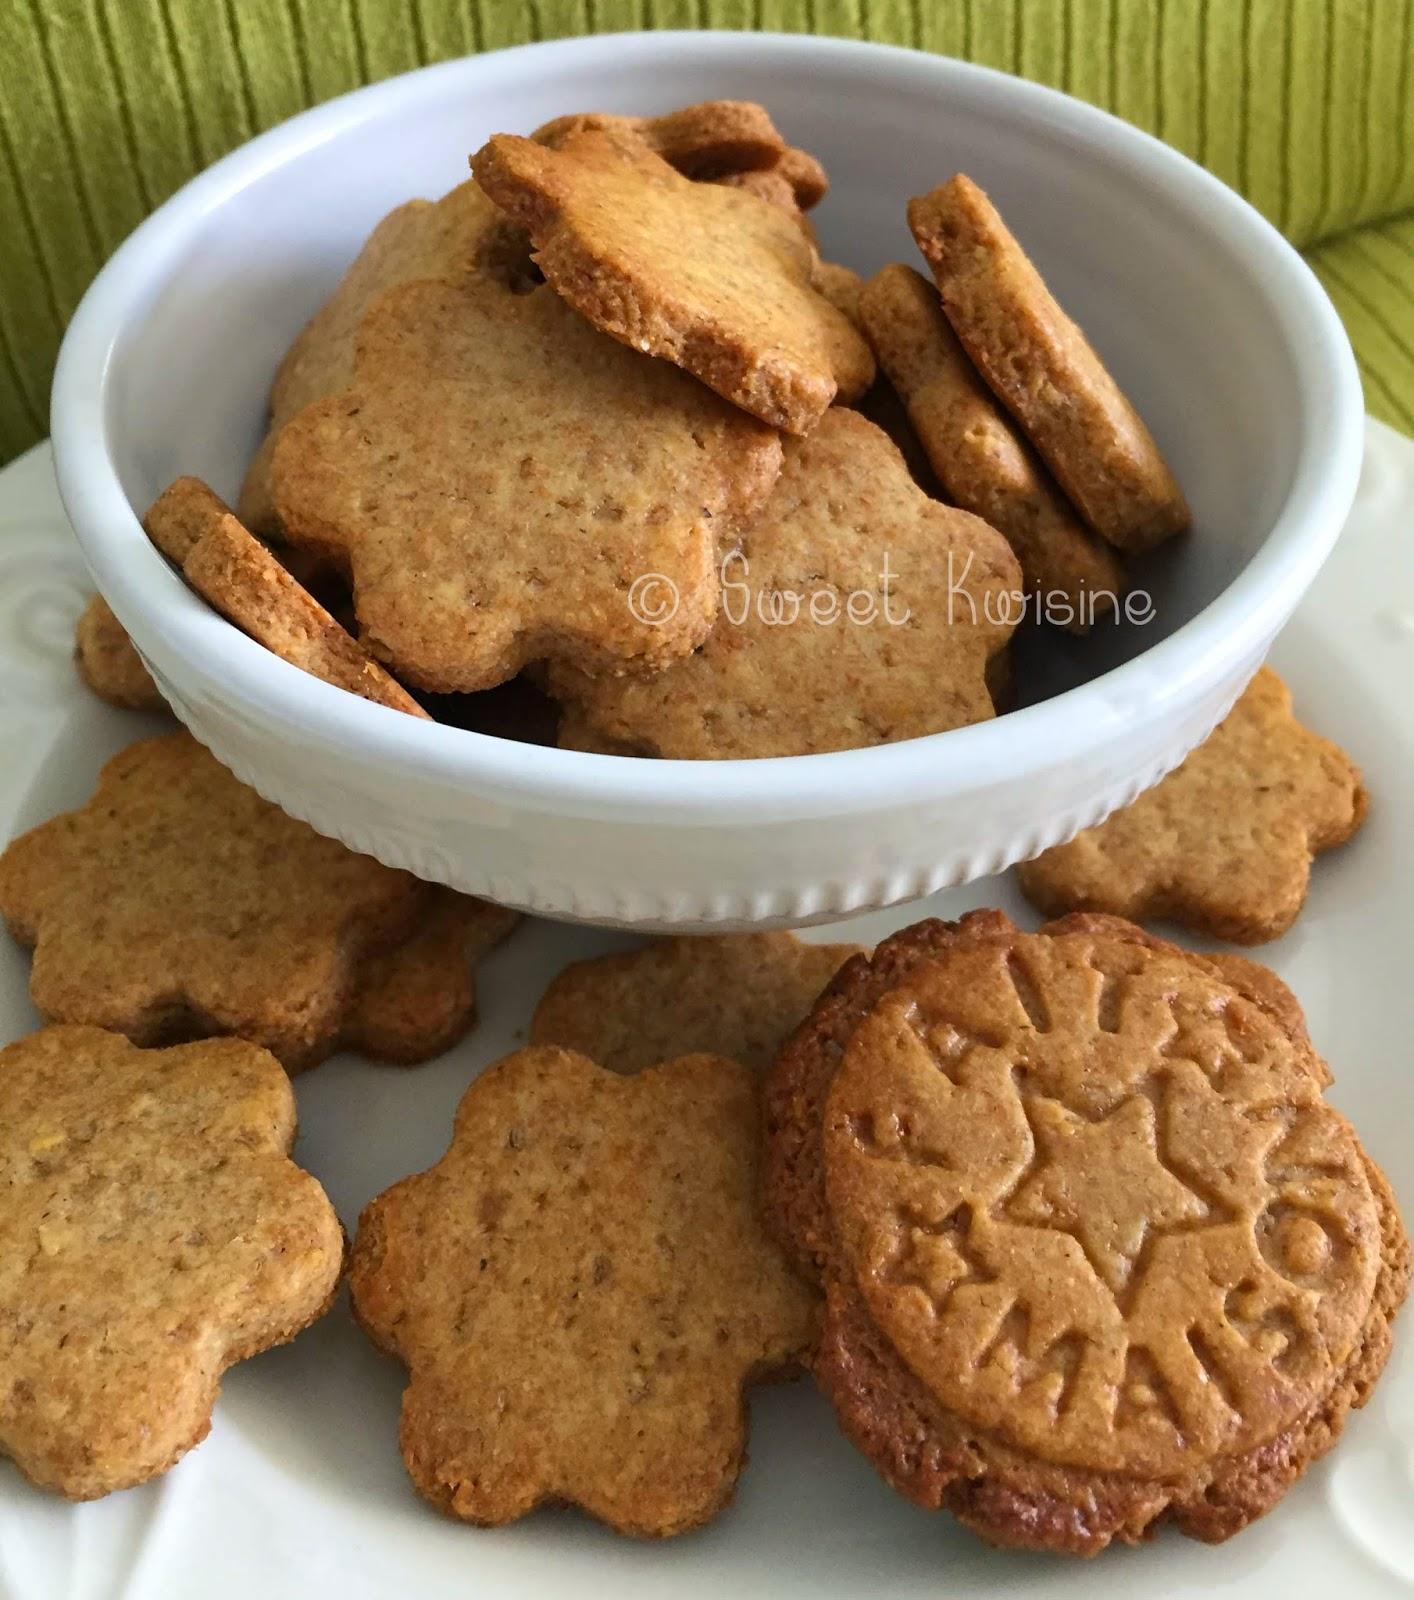 sweet kwisine, biscuits, sablés, farine complète, sans oeuf, miel, fève tonka, goûter